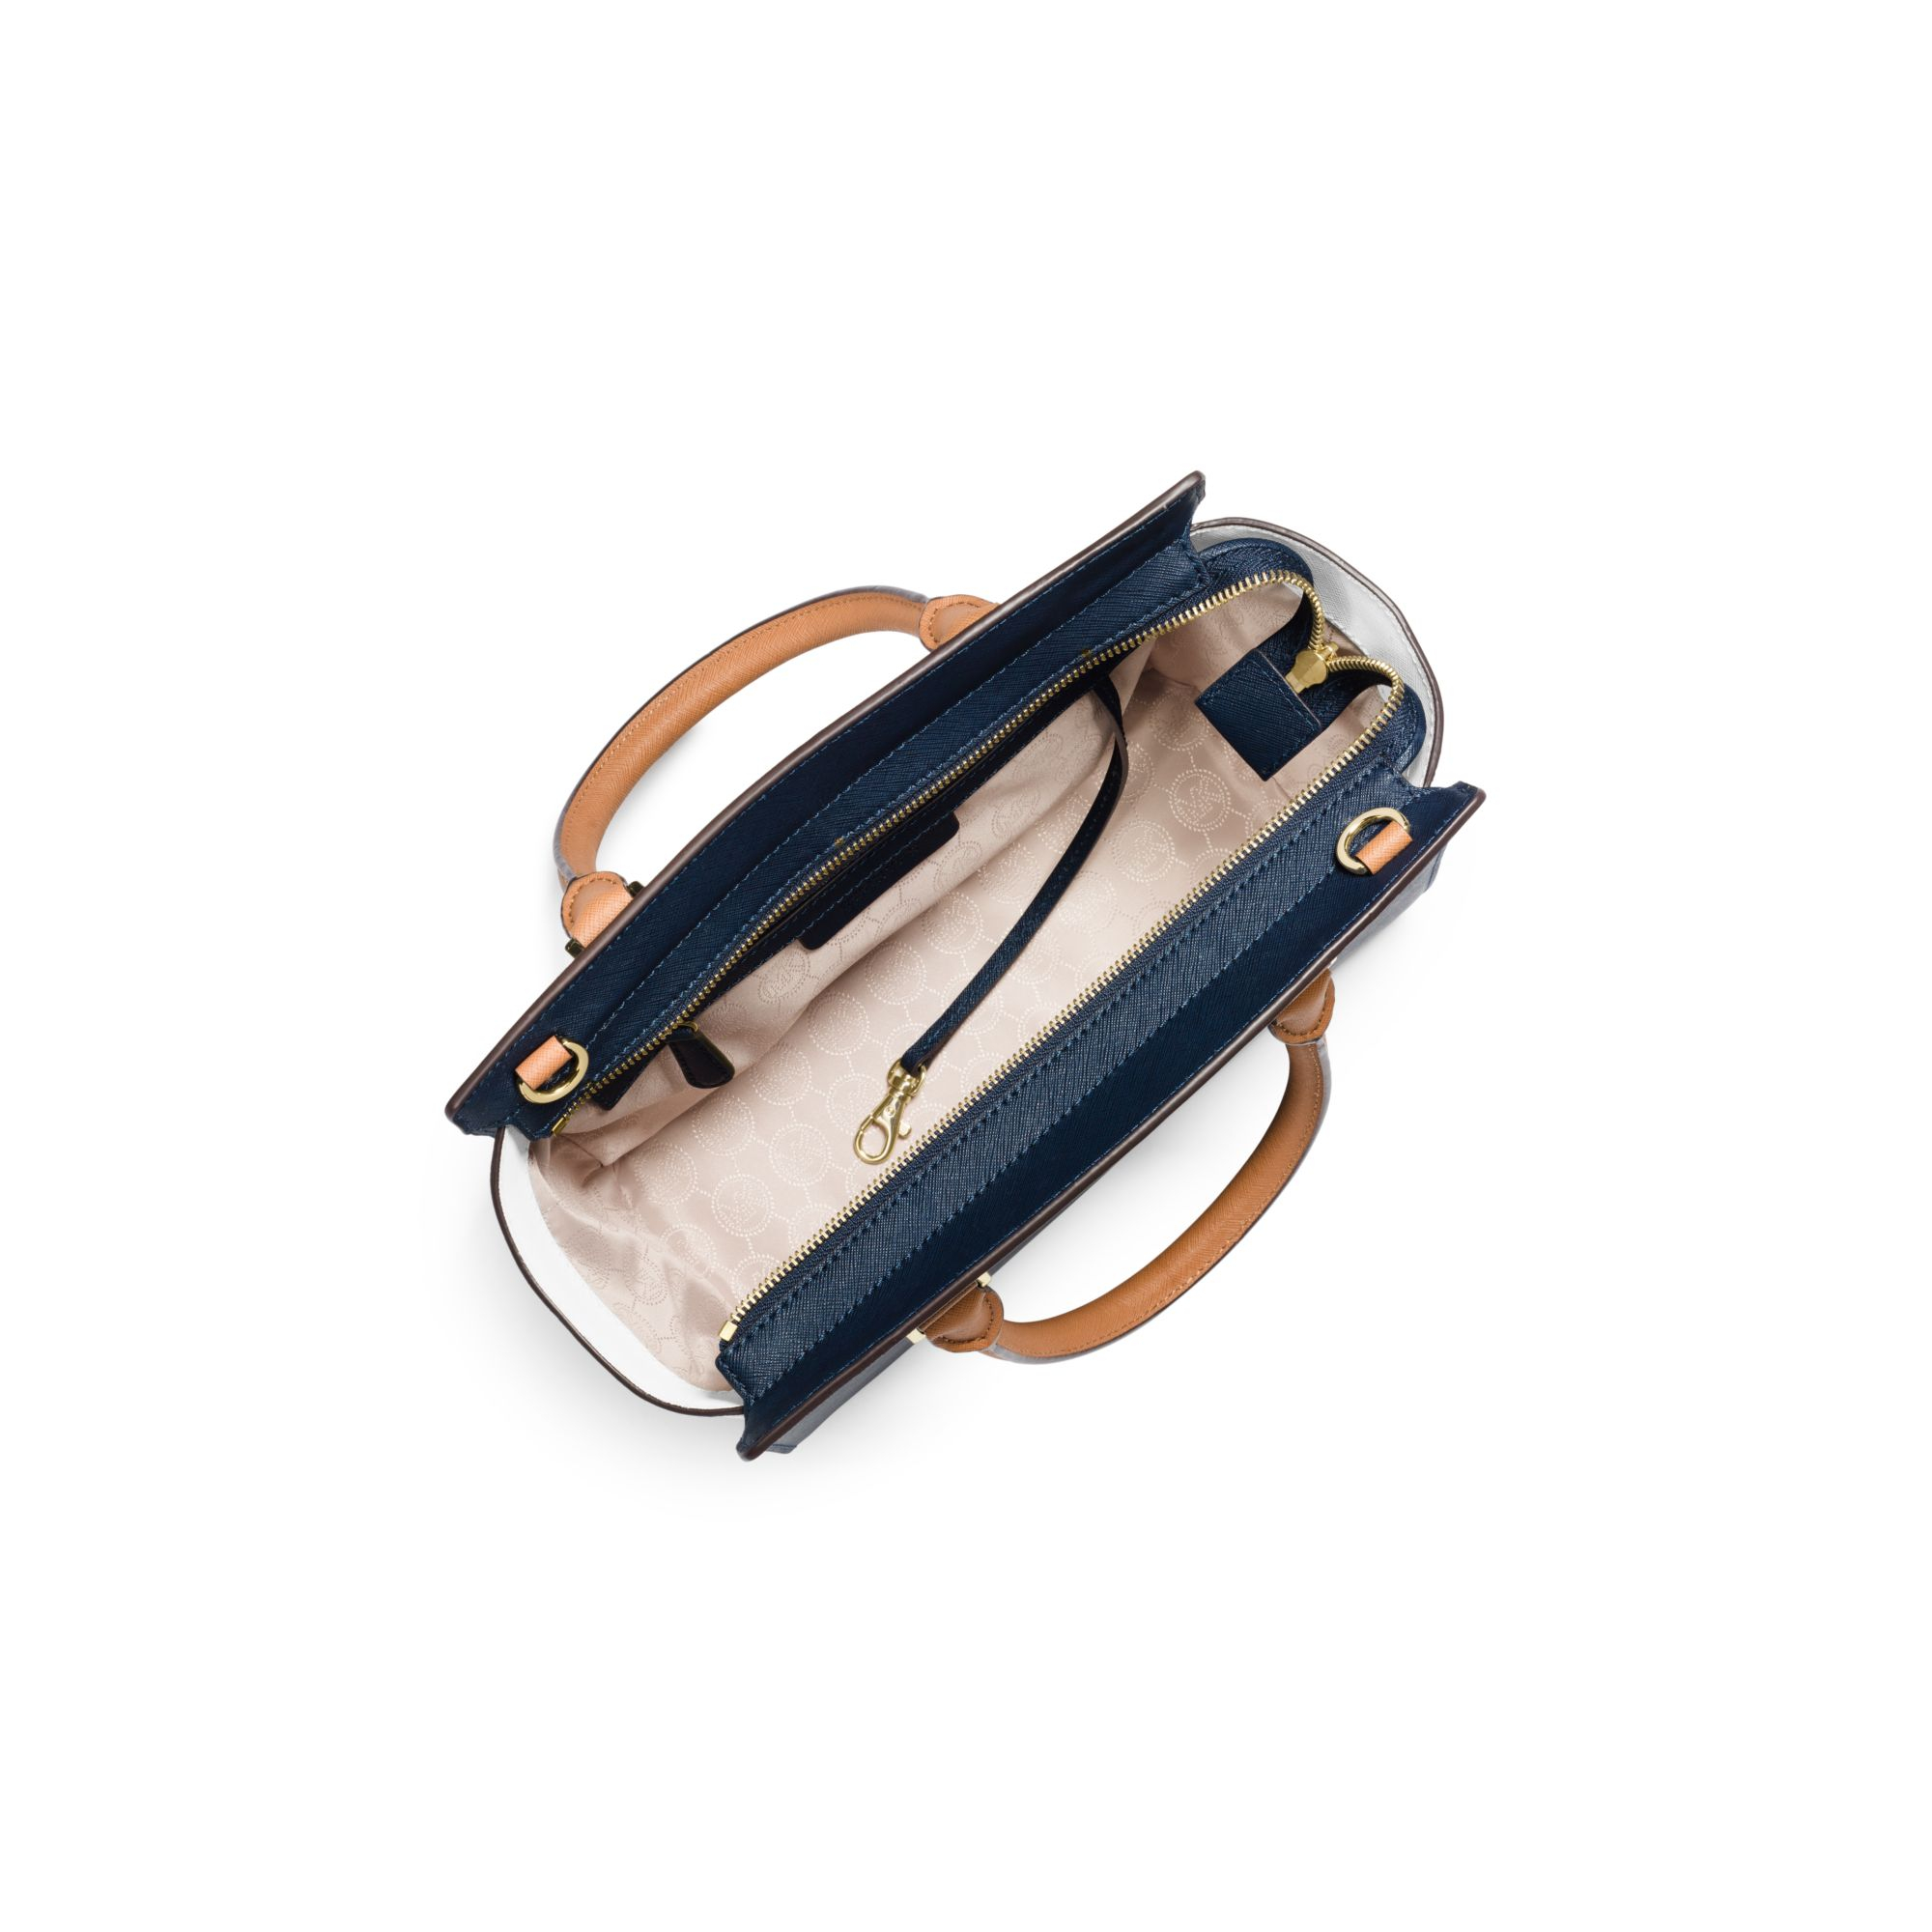 michael kors selma medium color block leather satchel in. Black Bedroom Furniture Sets. Home Design Ideas